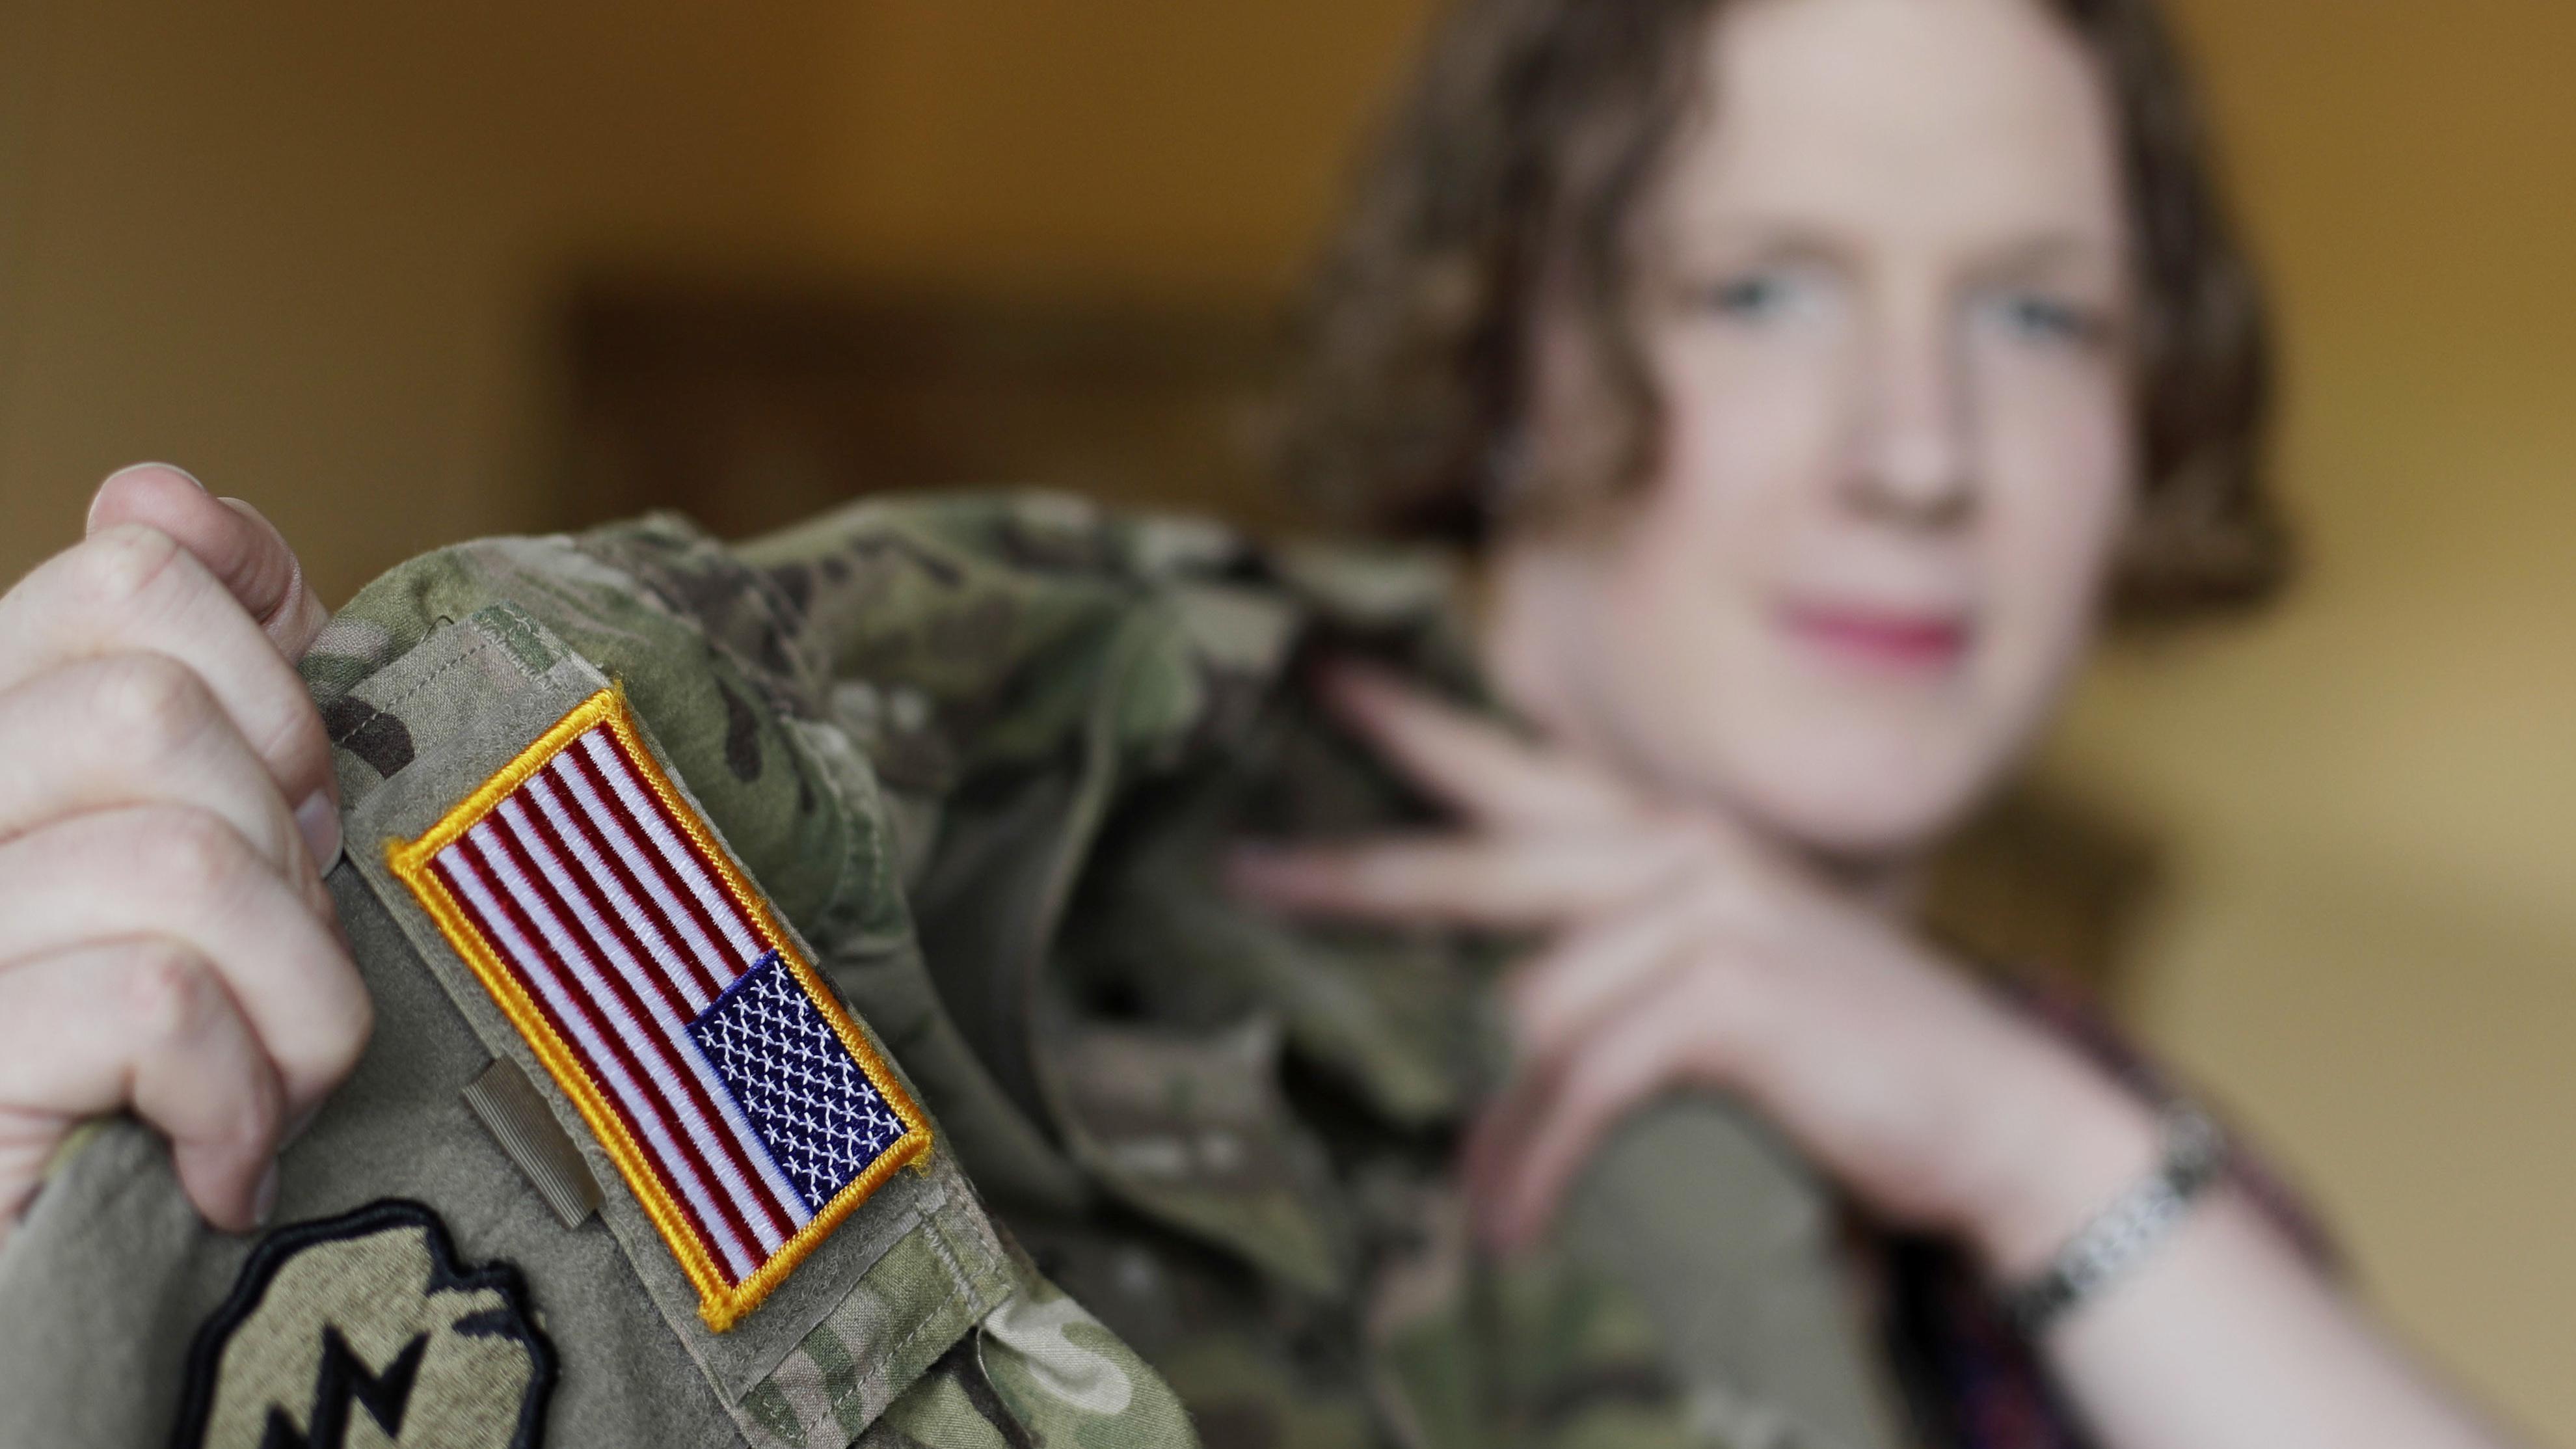 Transgender People Can Enlist in US Military Jan 1: Pentagon Official